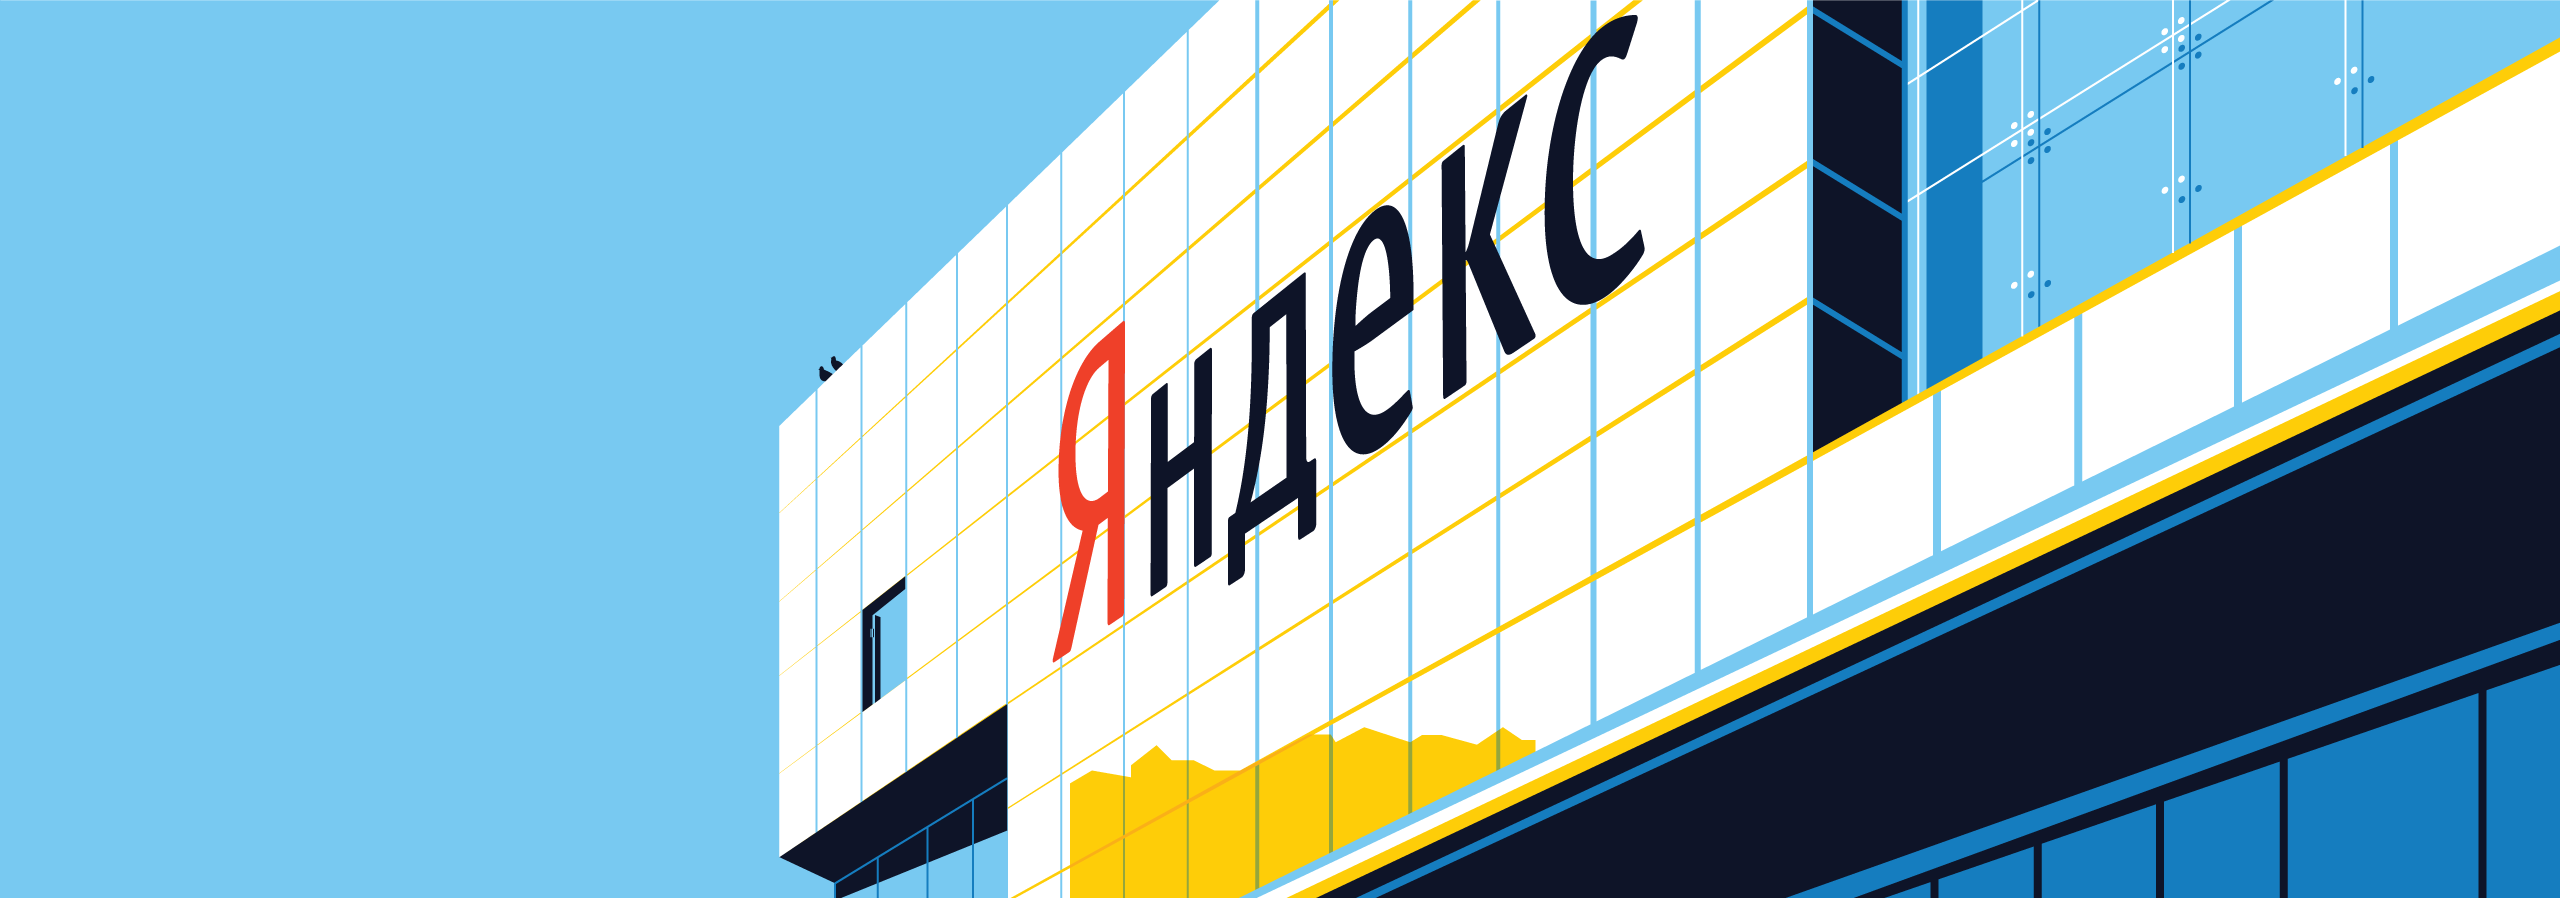 Яндекс присоединился к защите Linux и IT-индустрии от патентного троллинга - 1